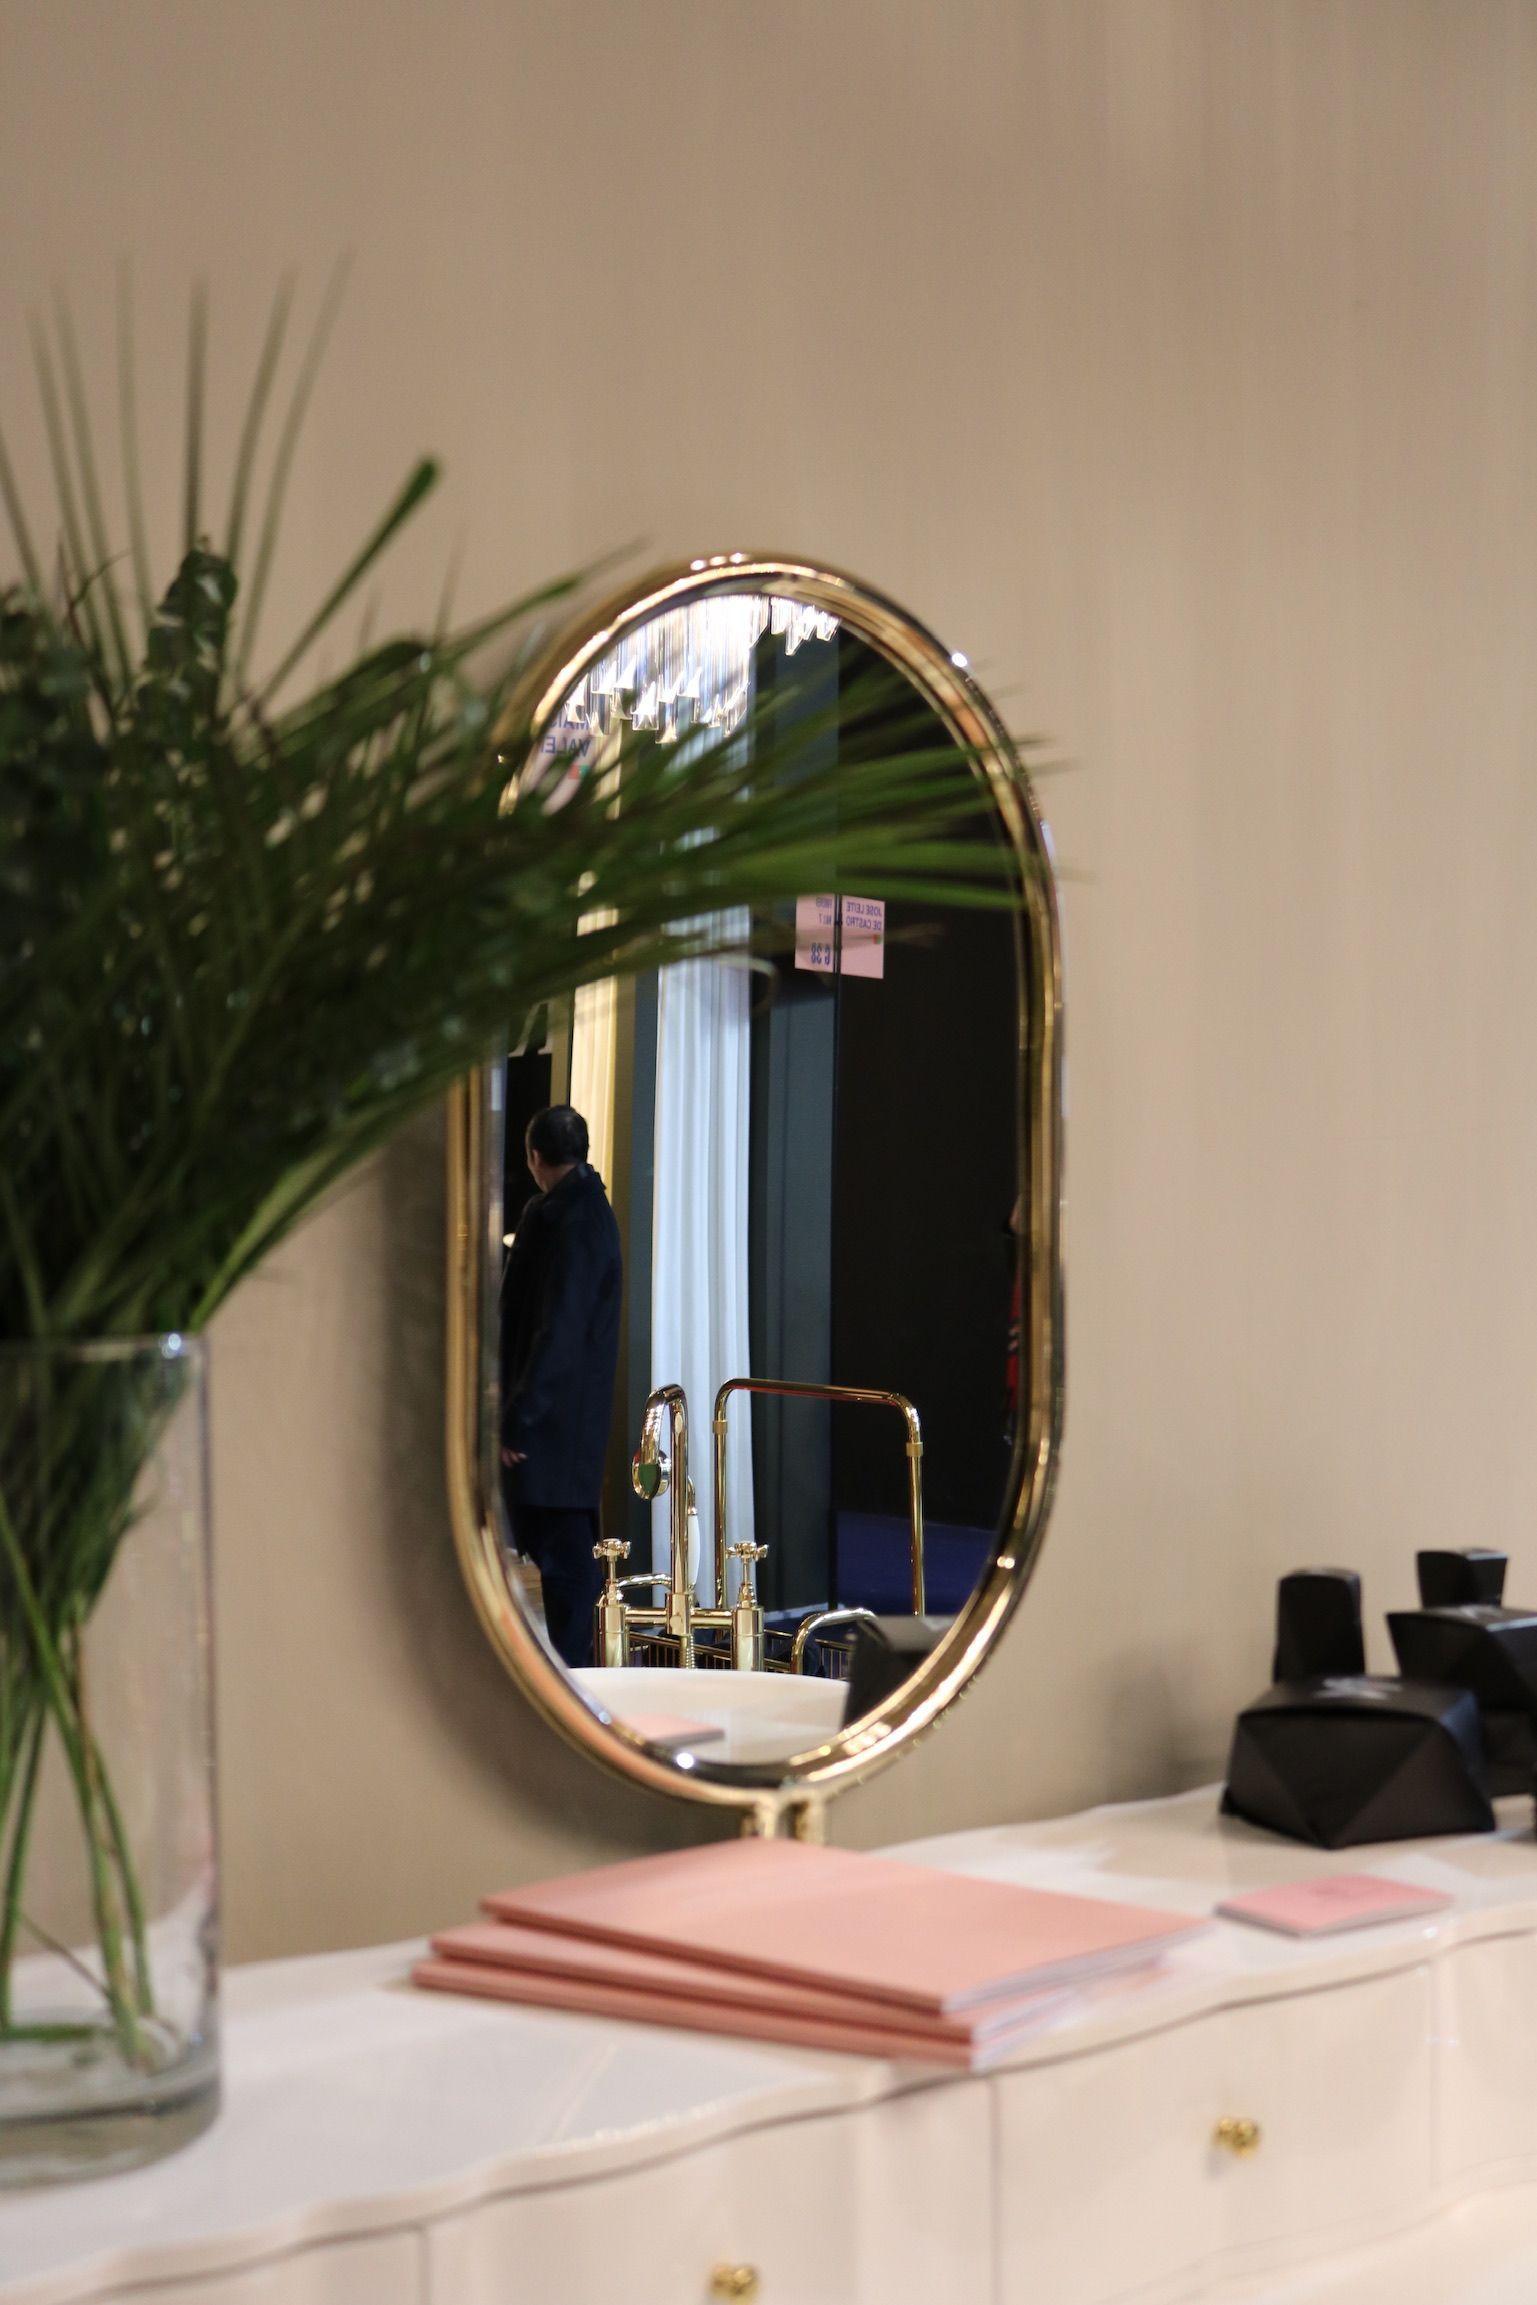 Interior Design Trends Presented At Maison Objet 2019 Luxury Interior Paris Design Luxury Interior Design